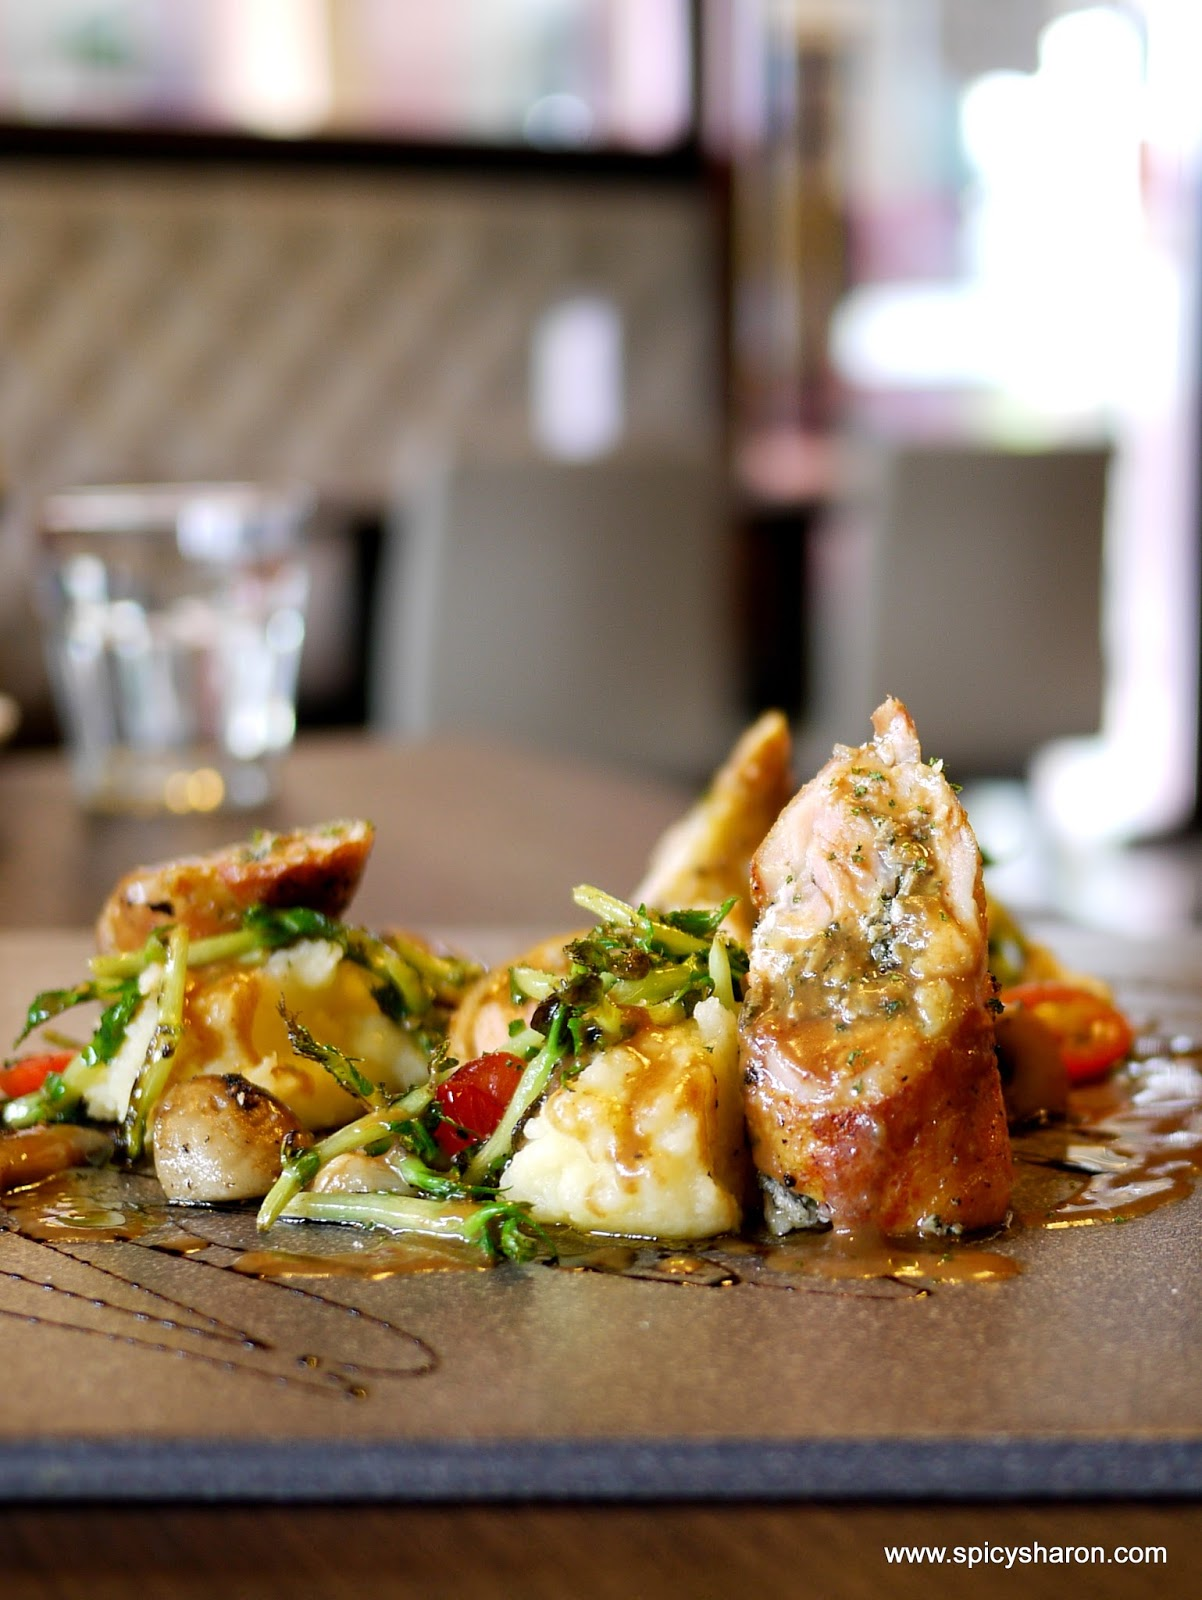 Pizzolo Italian Restaurant @ Atria PJ – Mushroom Truffle And Cheese Pizza. | Best Food Network